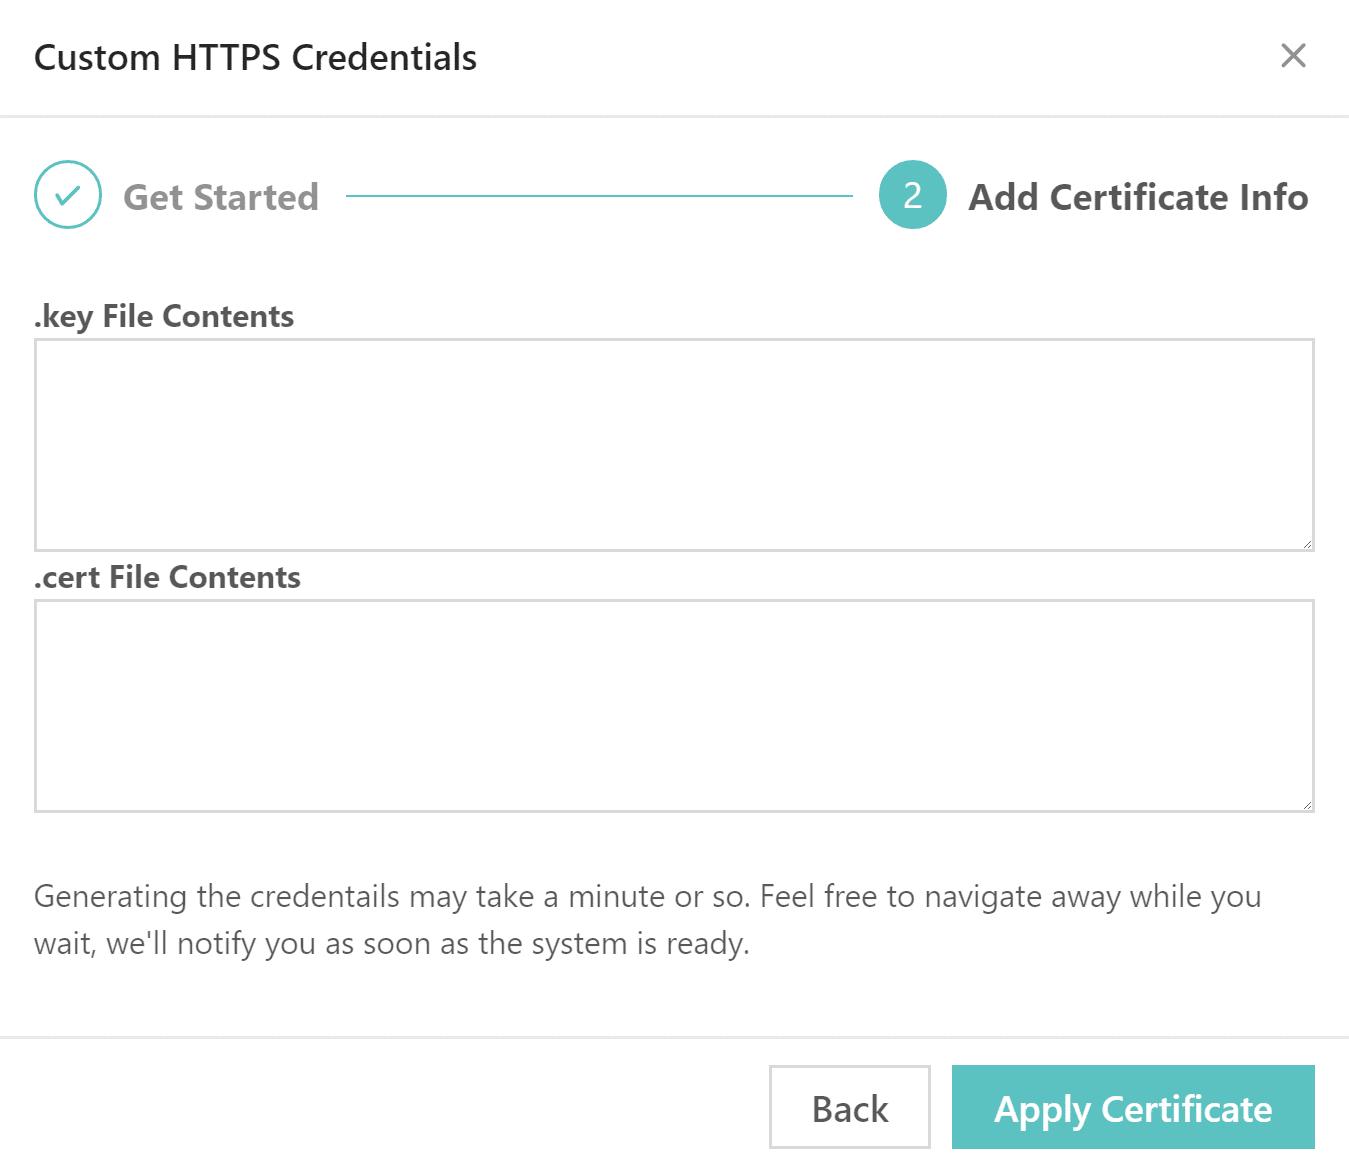 Apply certificate